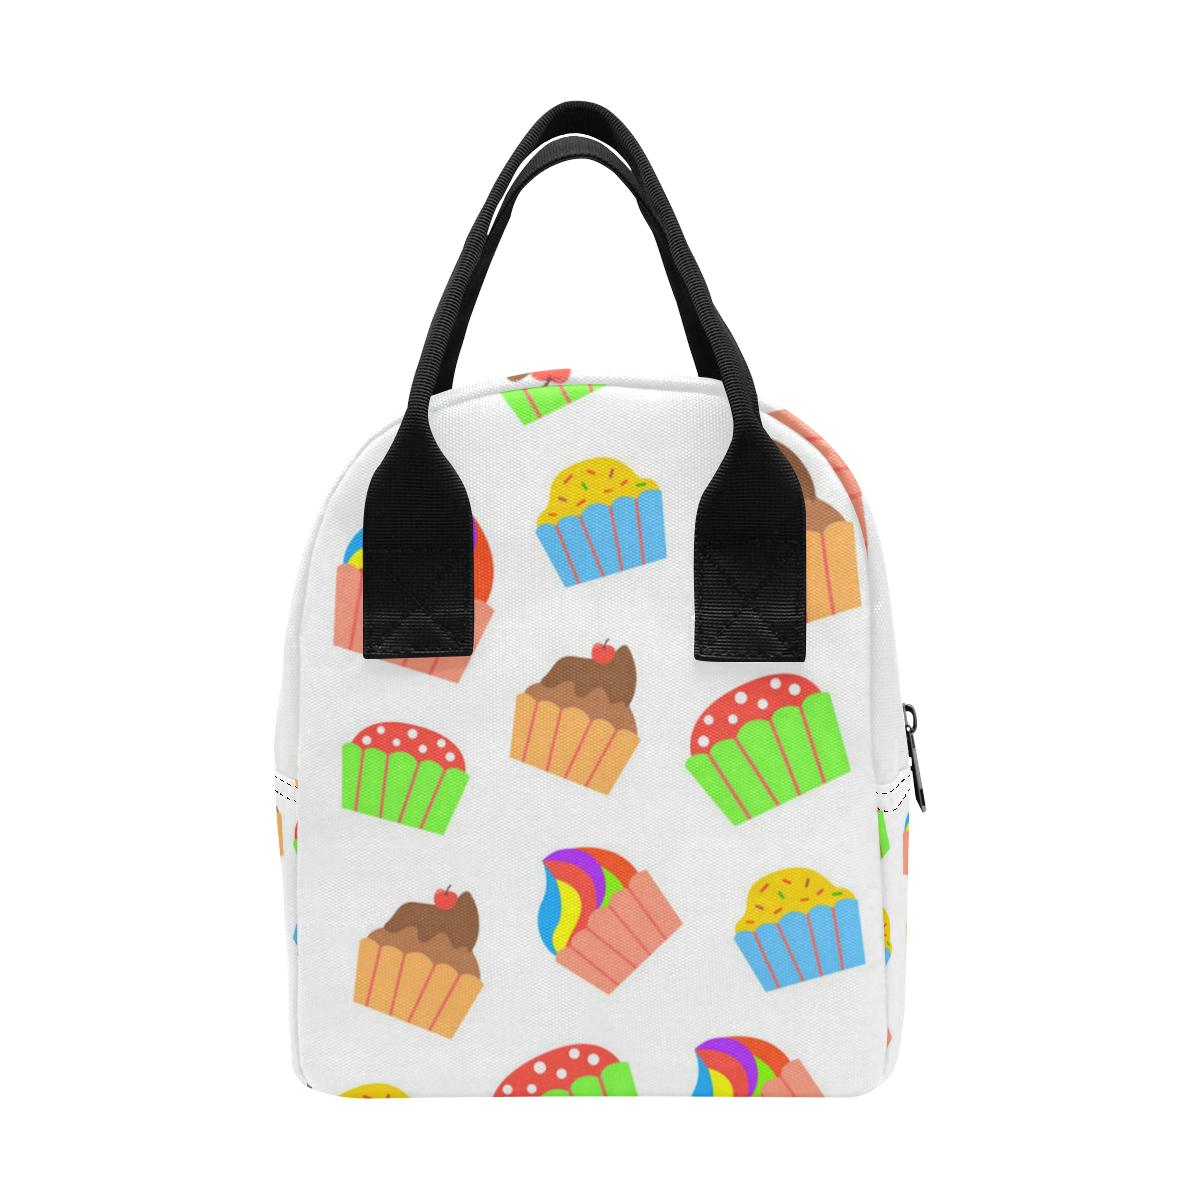 Cupcakes Lunch Bag Zipper Lunch Bag (Model 1689)